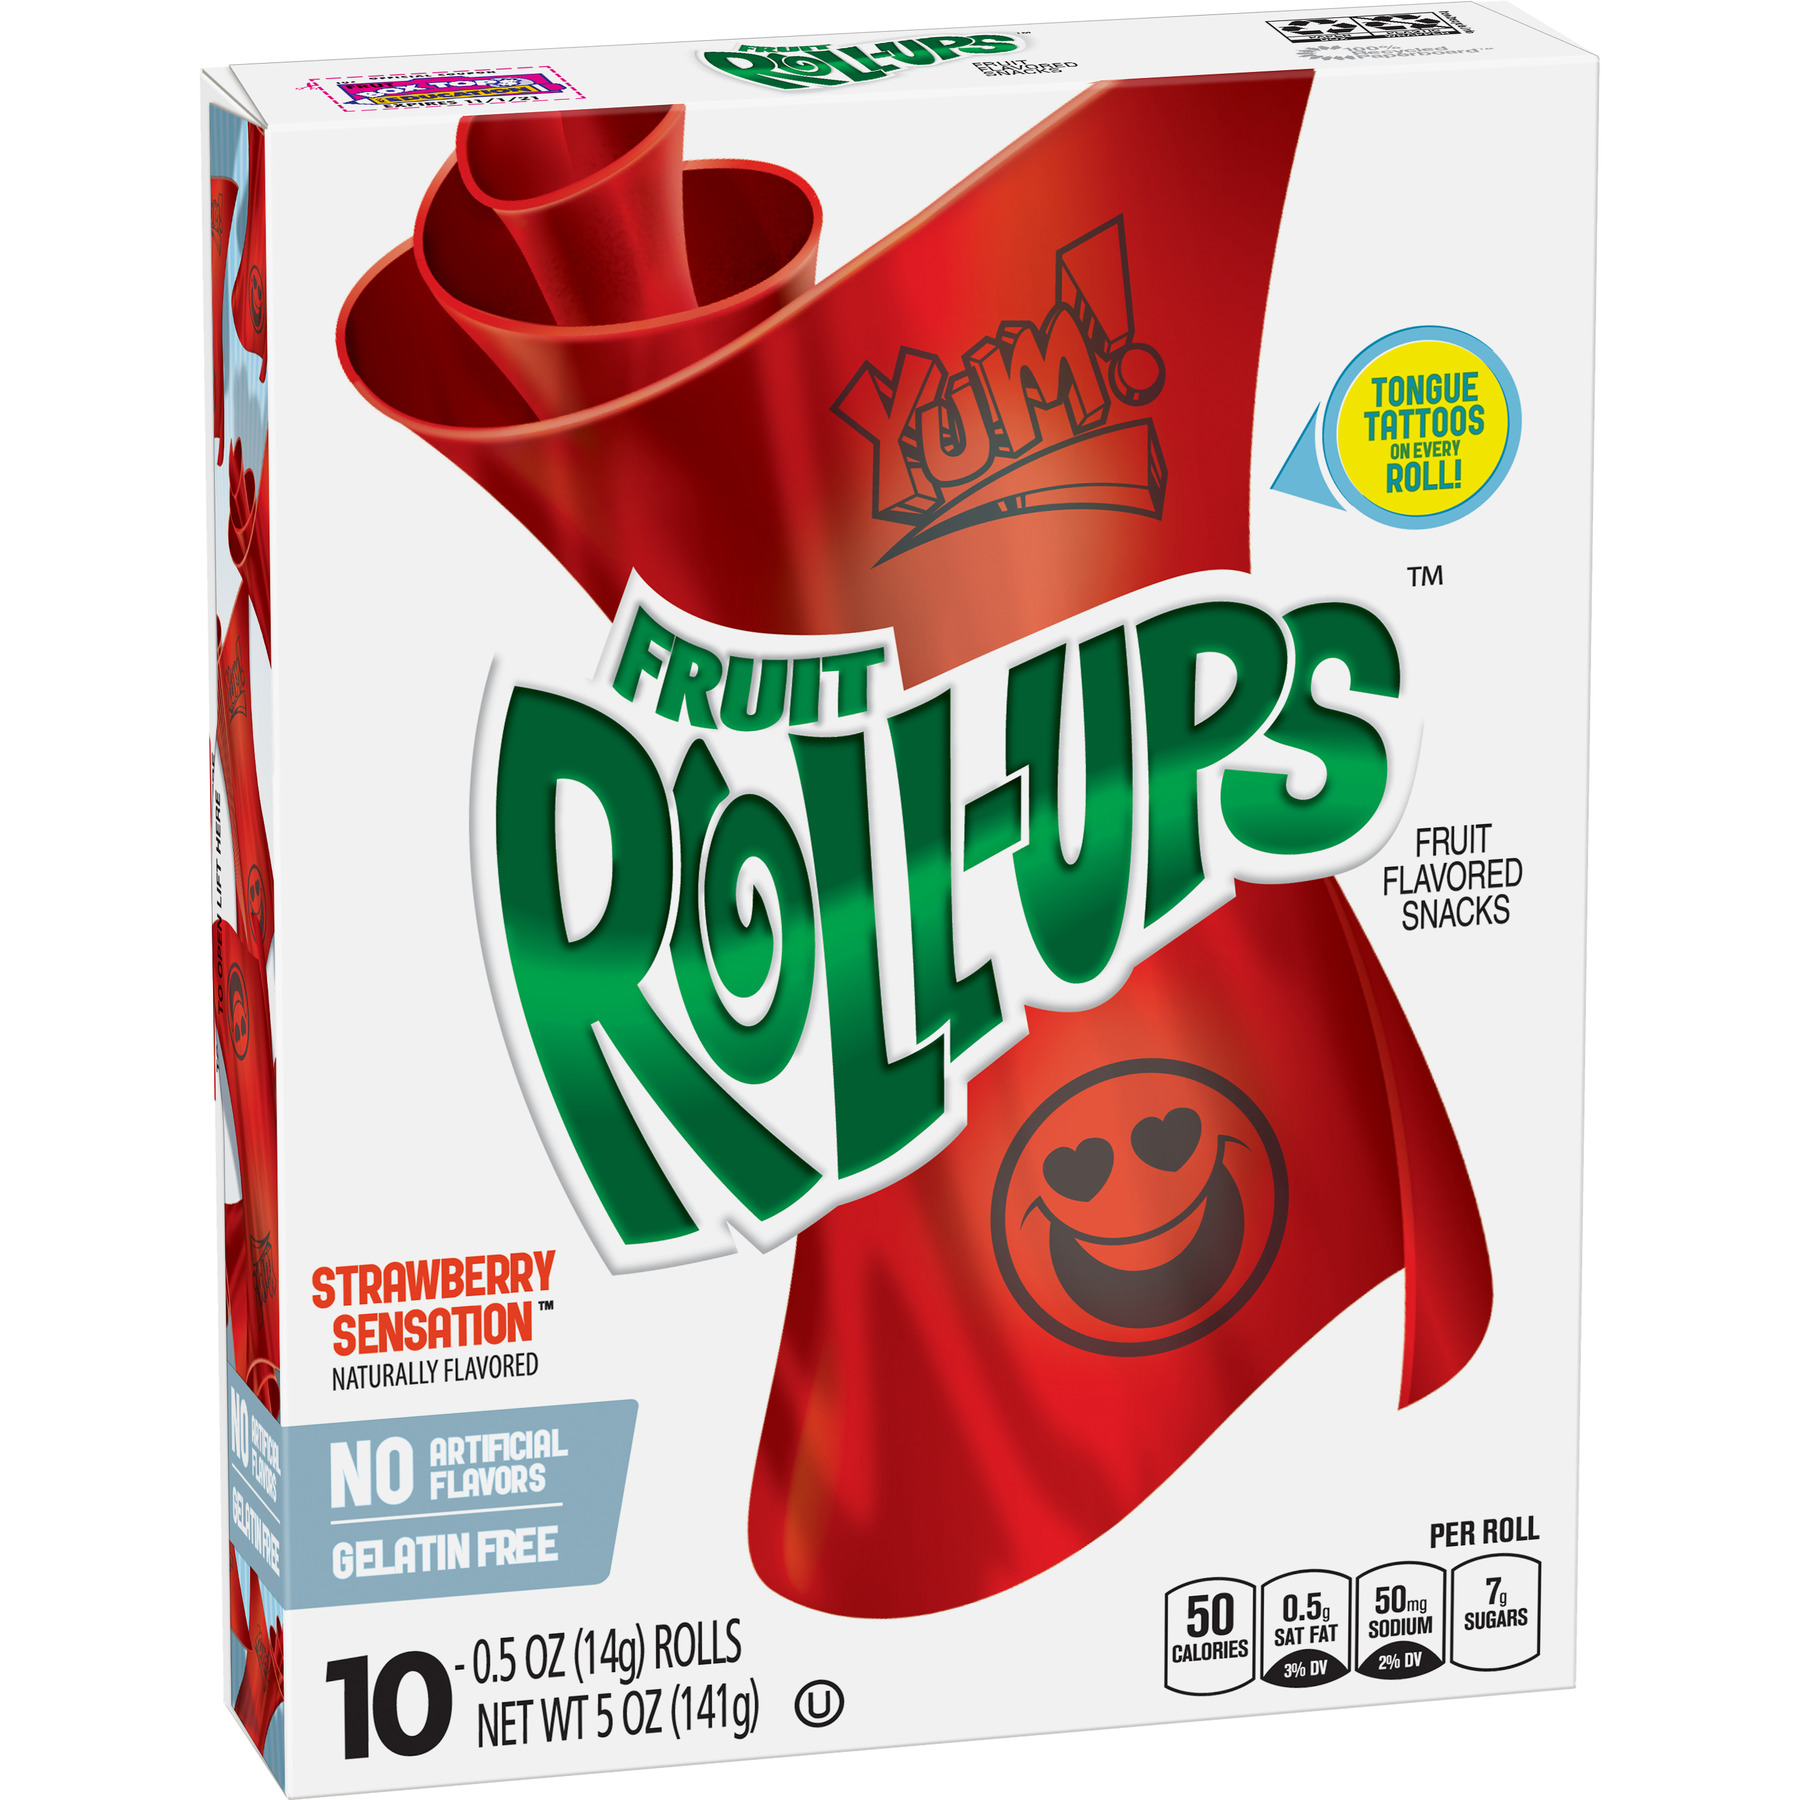 (4 Pack) Fruit Snacks Fruit Roll-Ups Strawberry Sensation 10 Rolls 0.5 oz Each